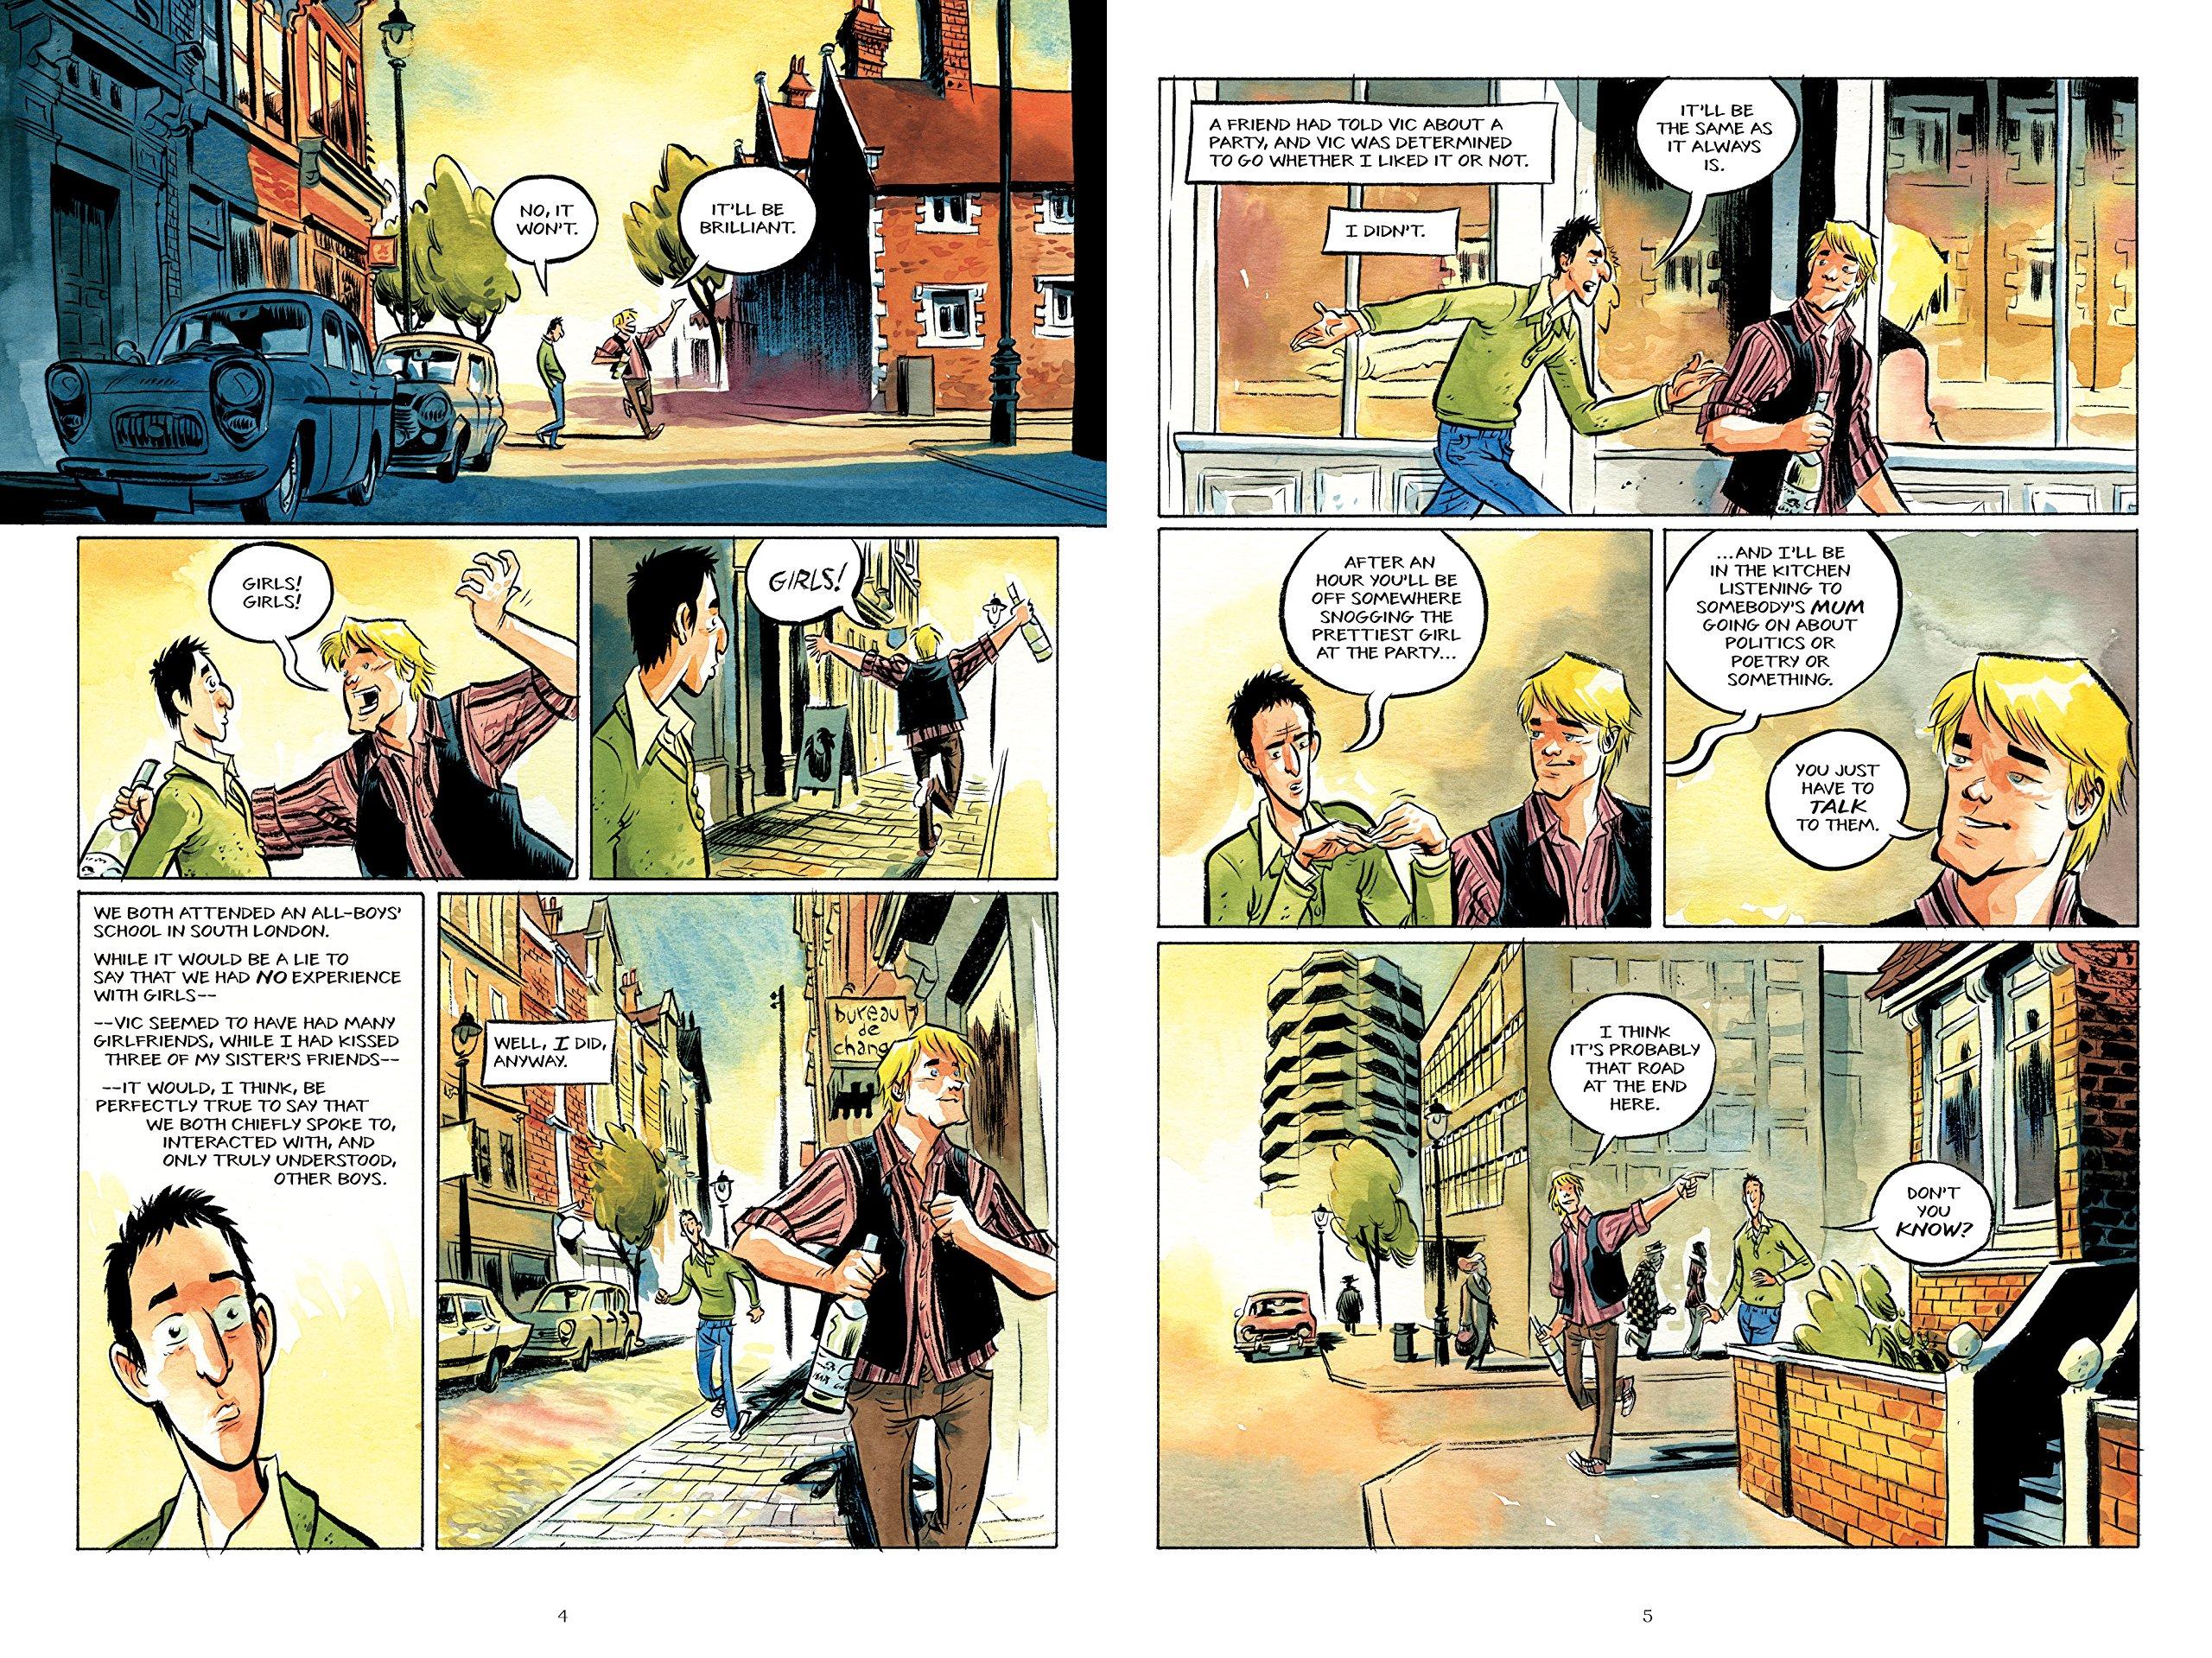 How To Talk To Girls At Parties: Amazon: Neil Gaiman, F�bio Moon,  Gabriel B�: 9781472242488: Books